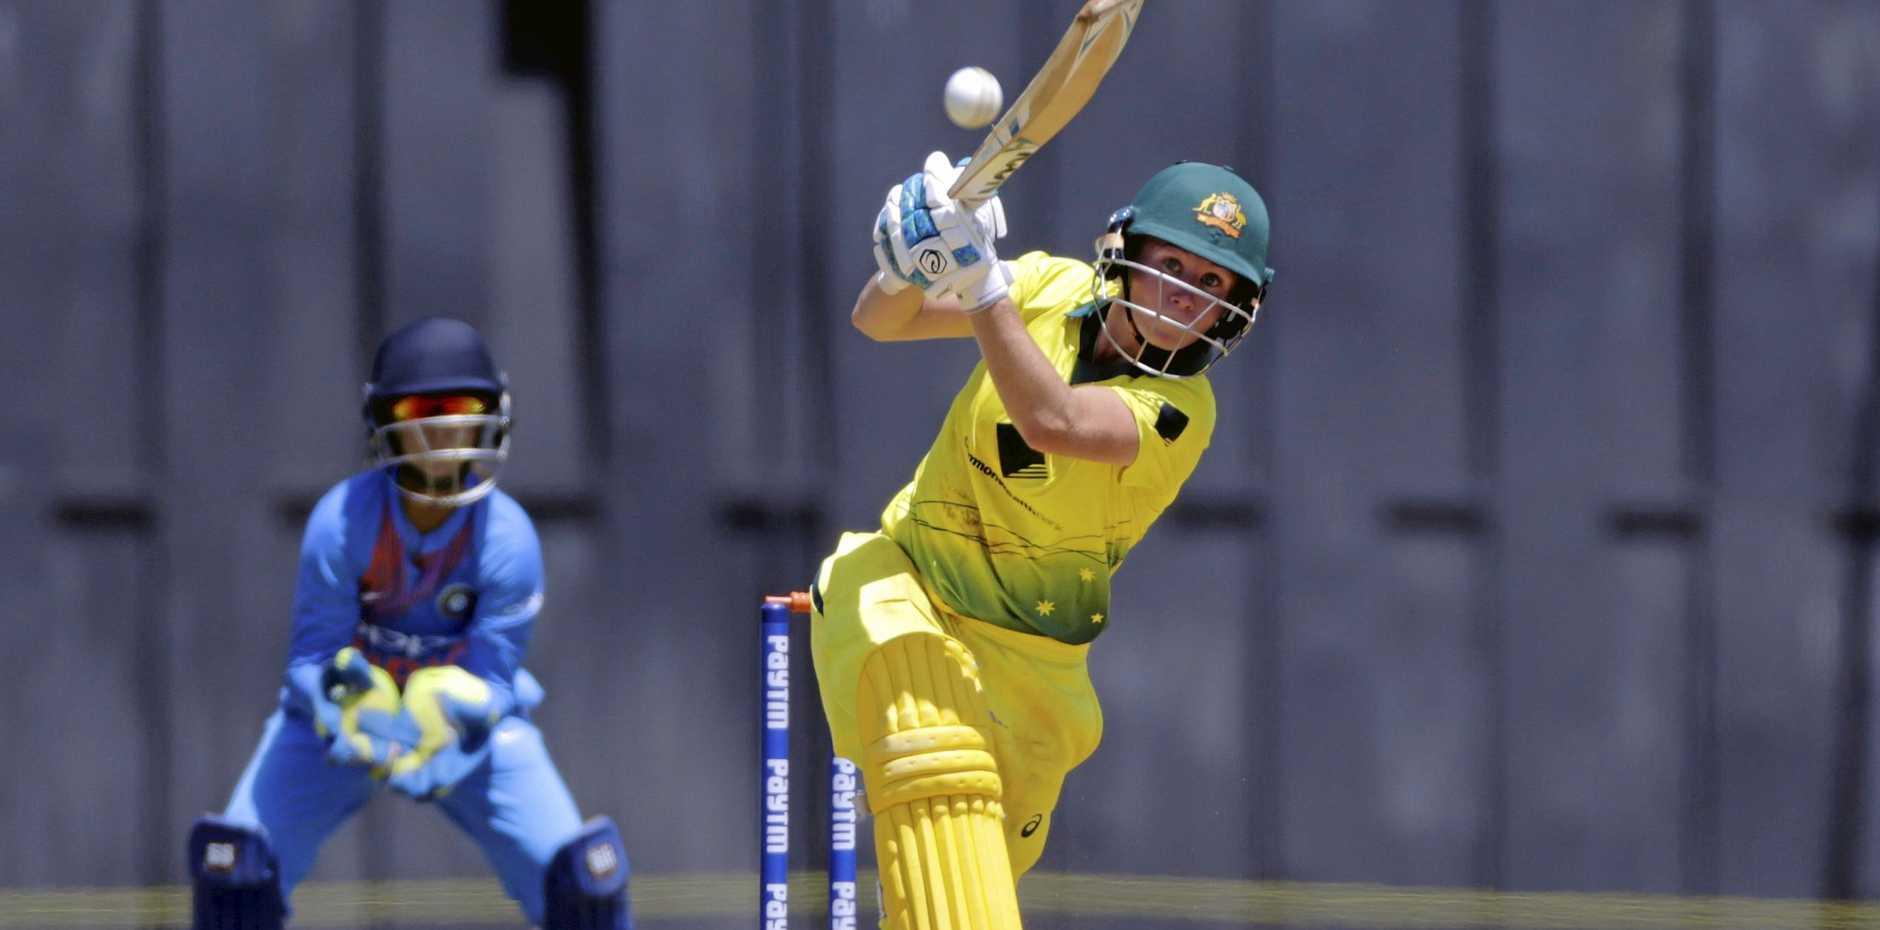 Australia's Beth Mooney bats against India during their cricket match at the Women's T20 Triangular Series in Mumbai, India, Thursday, March. 22, 2018. (AP Photo/Rajanish Kakade)